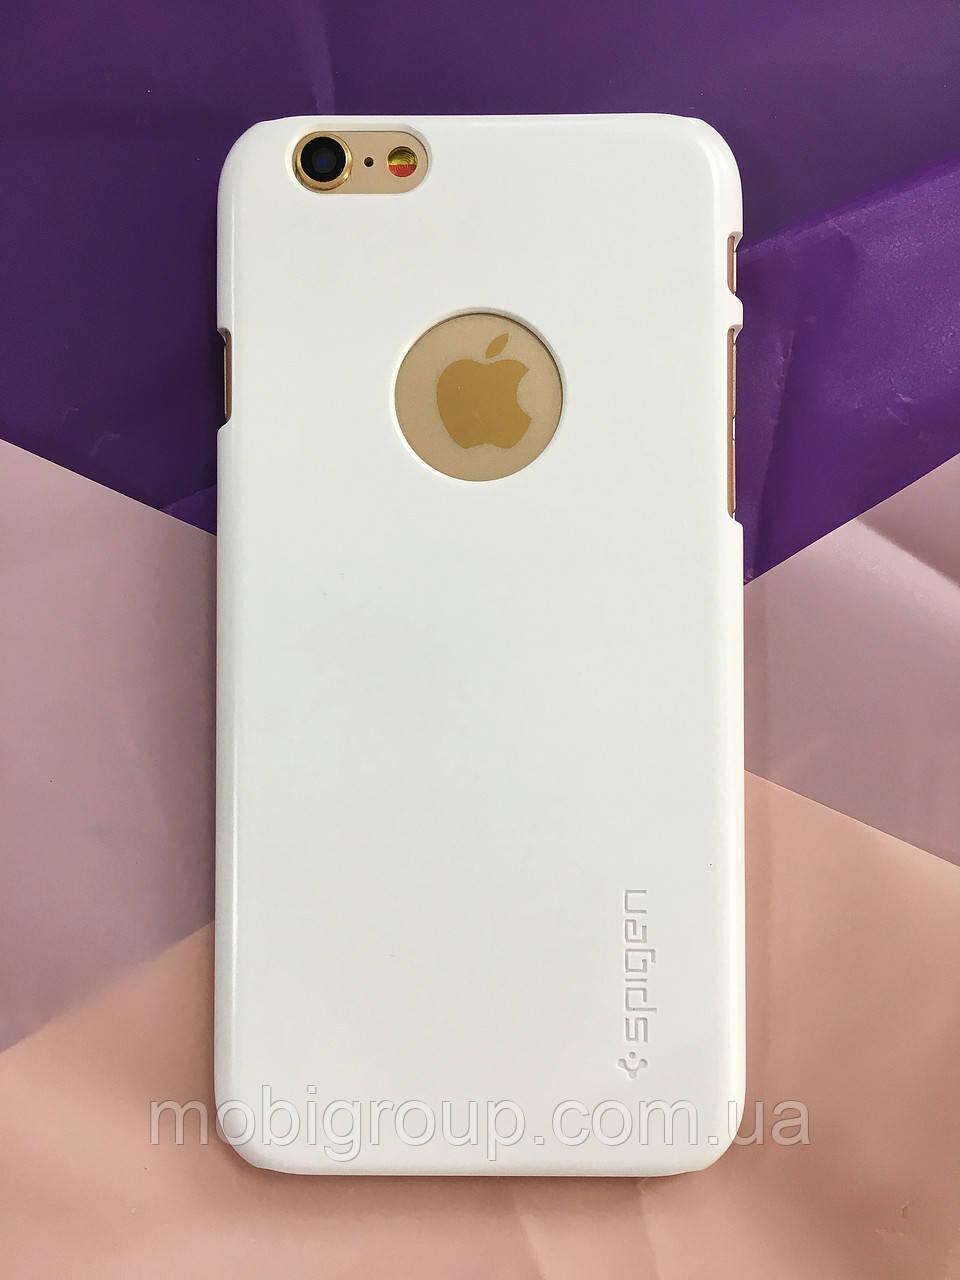 Чехол Spigen Thin Fit с вырезом под Logo iPhone 6S\6 (HQ-копия), White